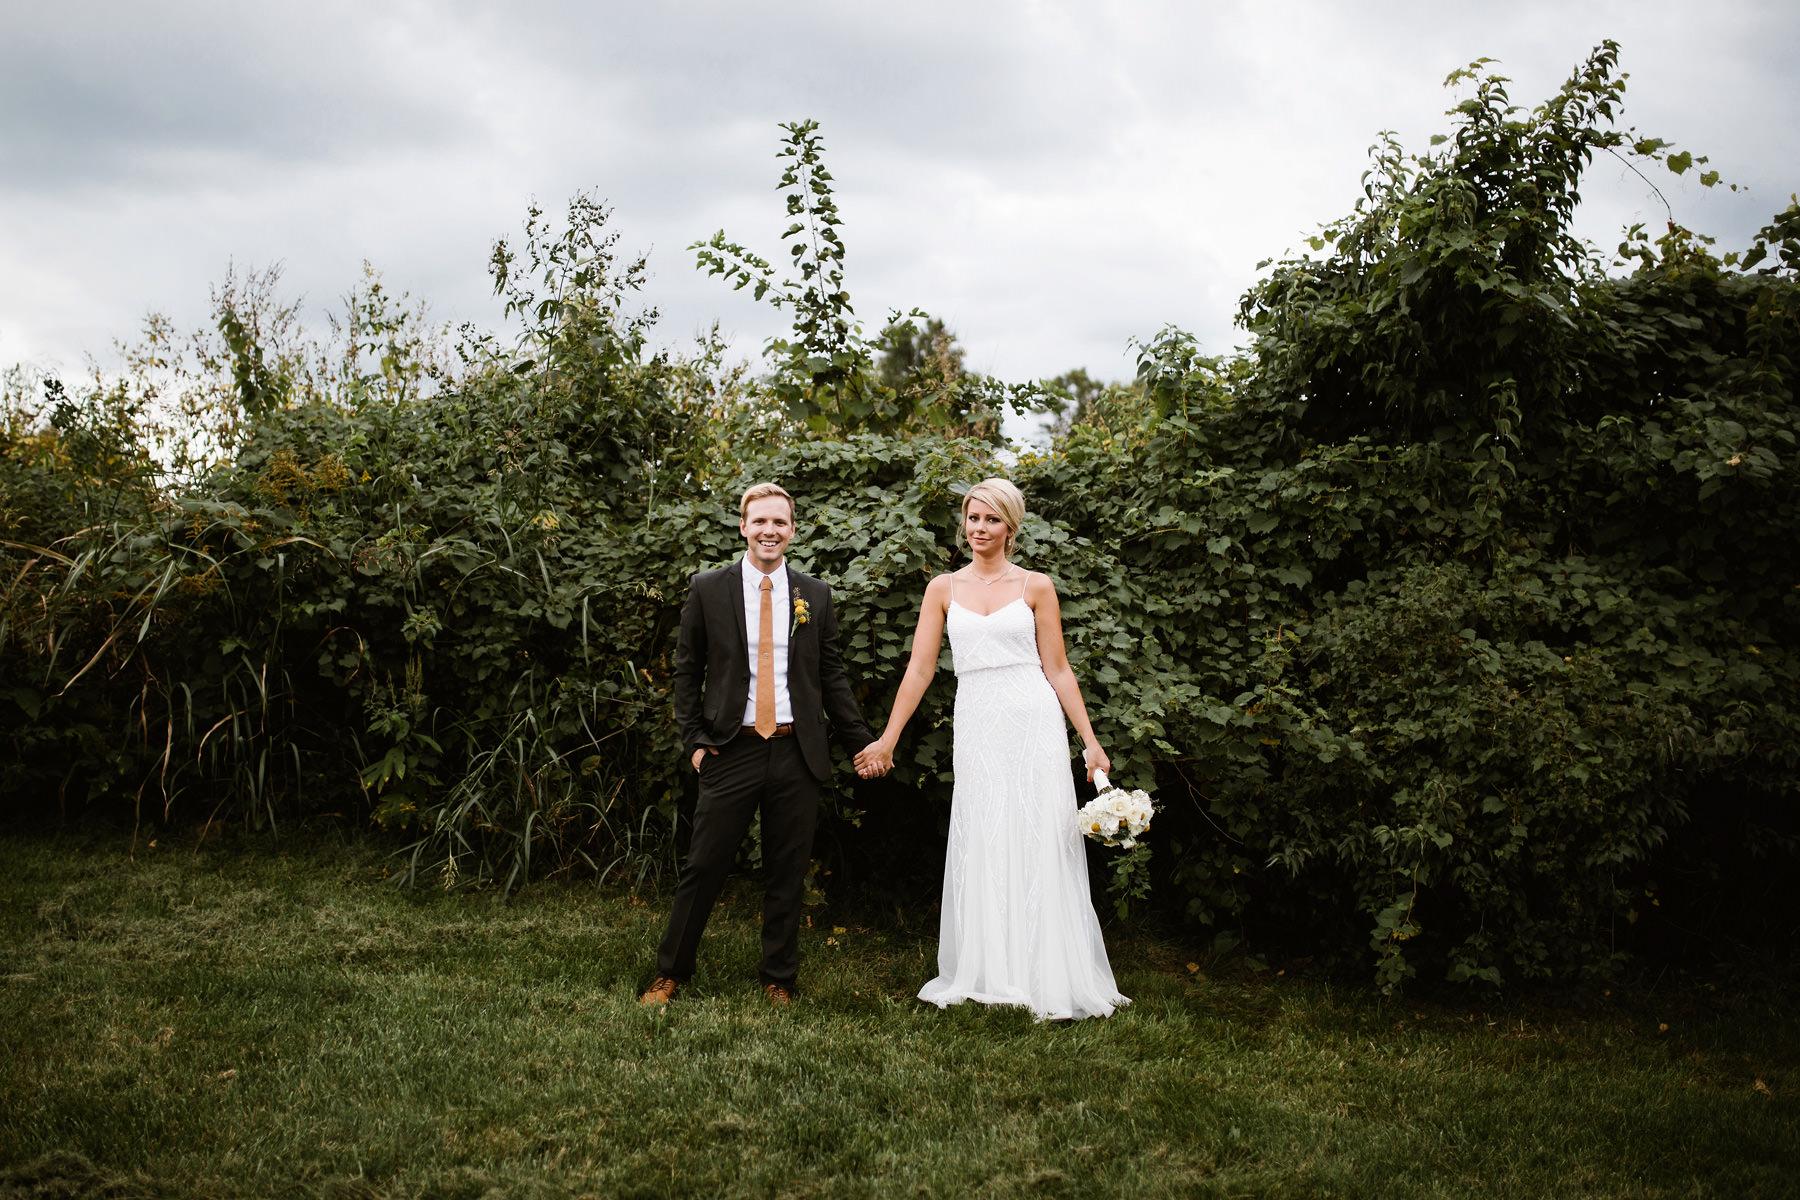 Alldredge Orchard Kansas City_Kindling Wedding Photography BLOG 55.JPG